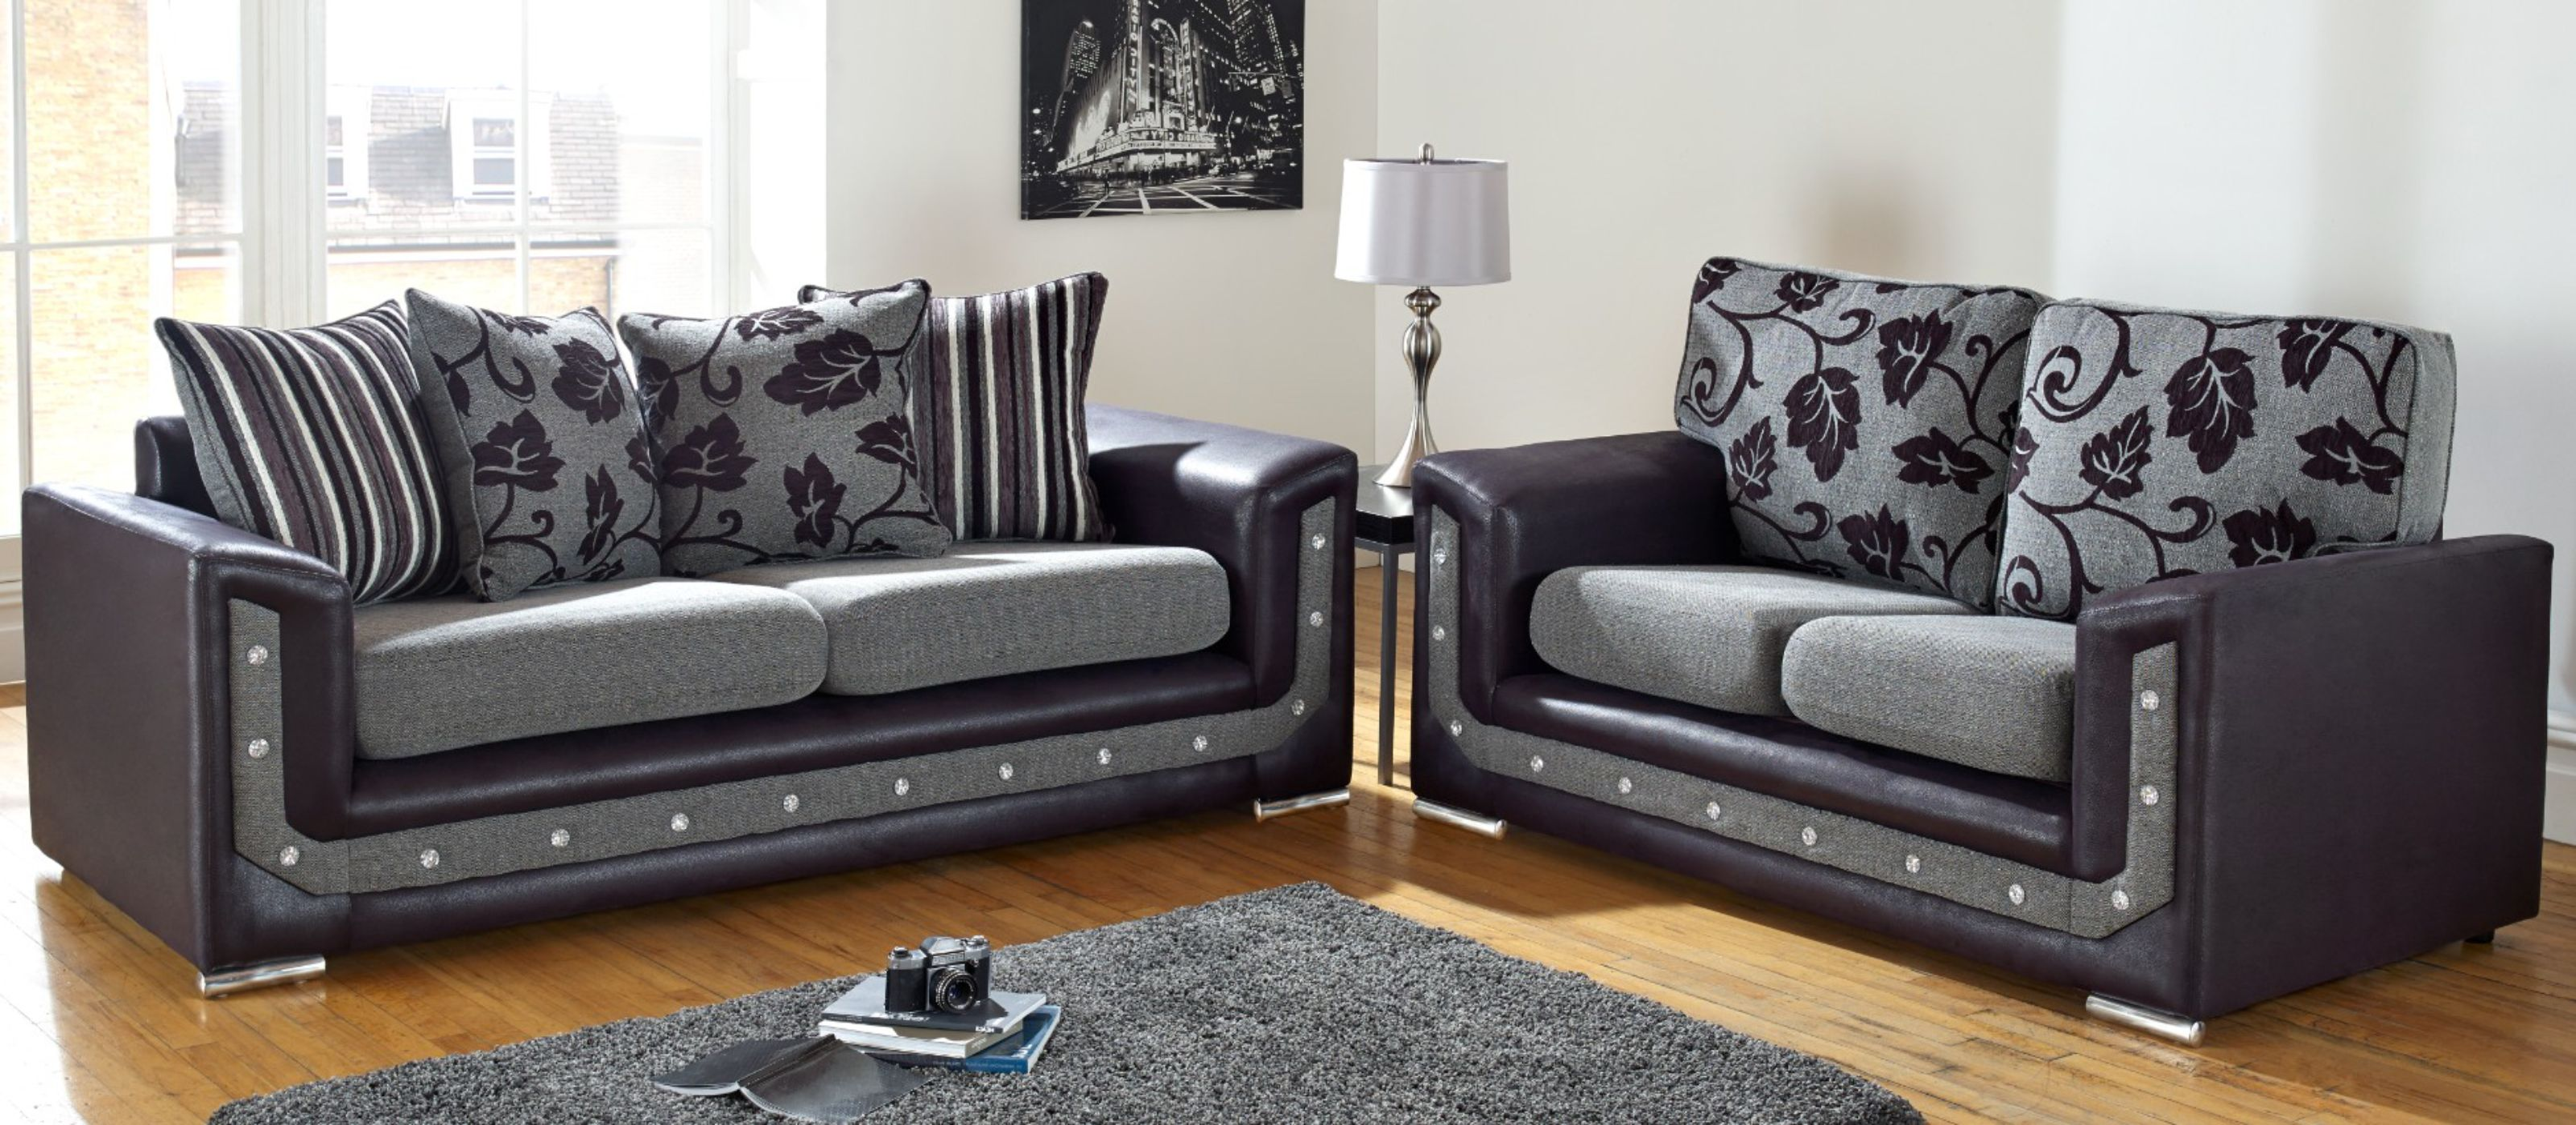 grey fabric sofa uk italian designs india settee suite set international delivery designersofas4u las vegas 3 2 swarovski crystal diamante